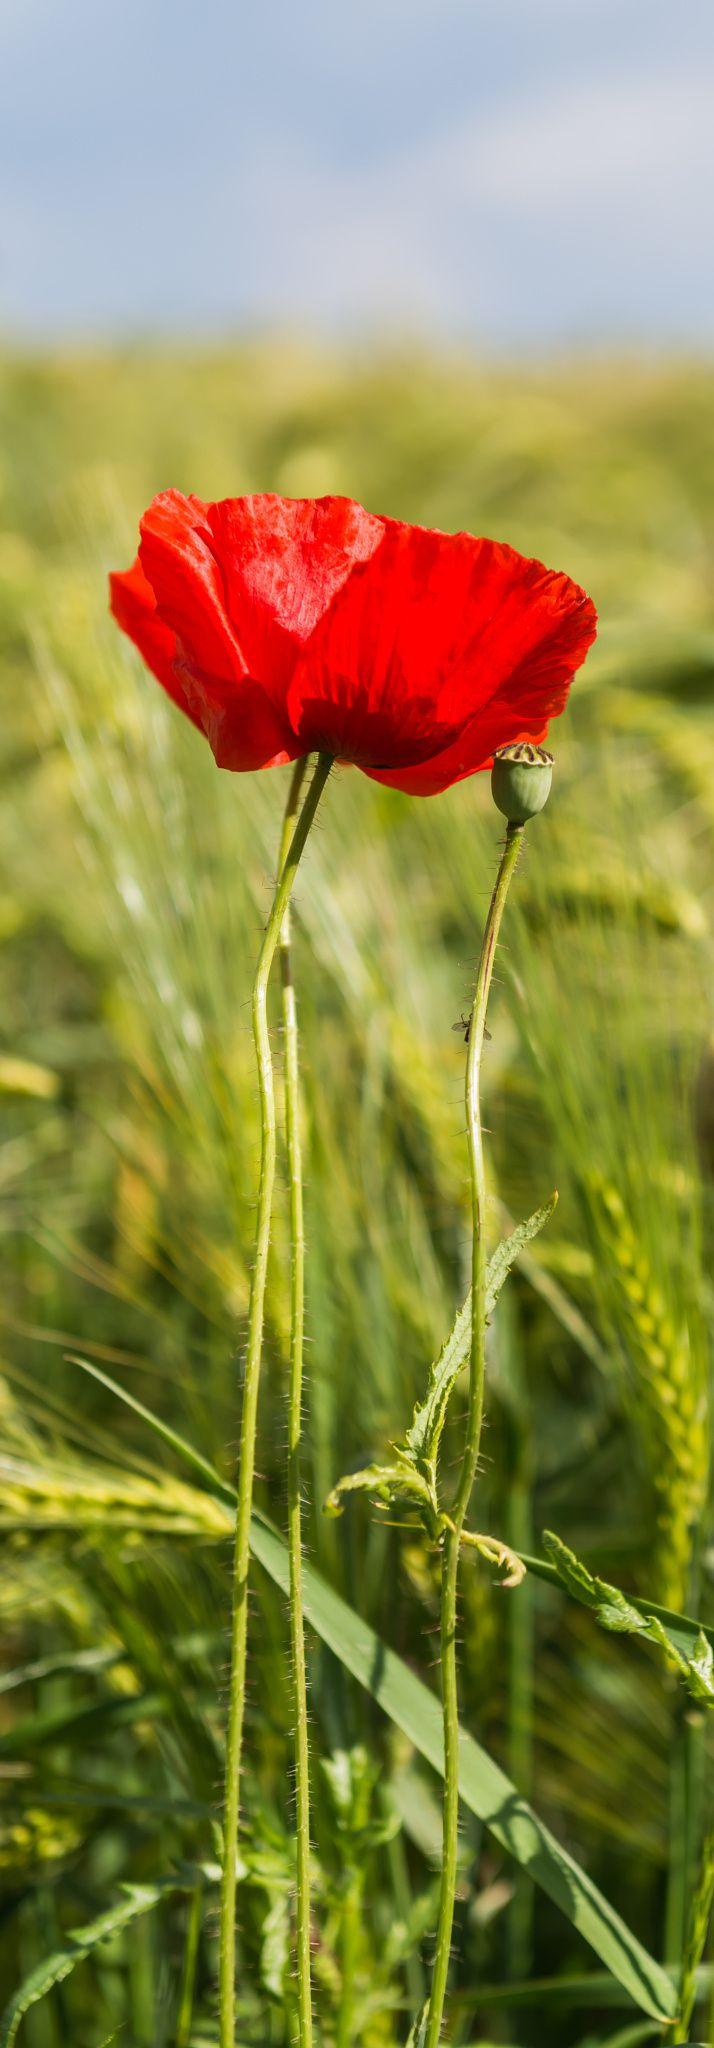 ~~last summer   Red Poppy   by Ulf Koepnick~~